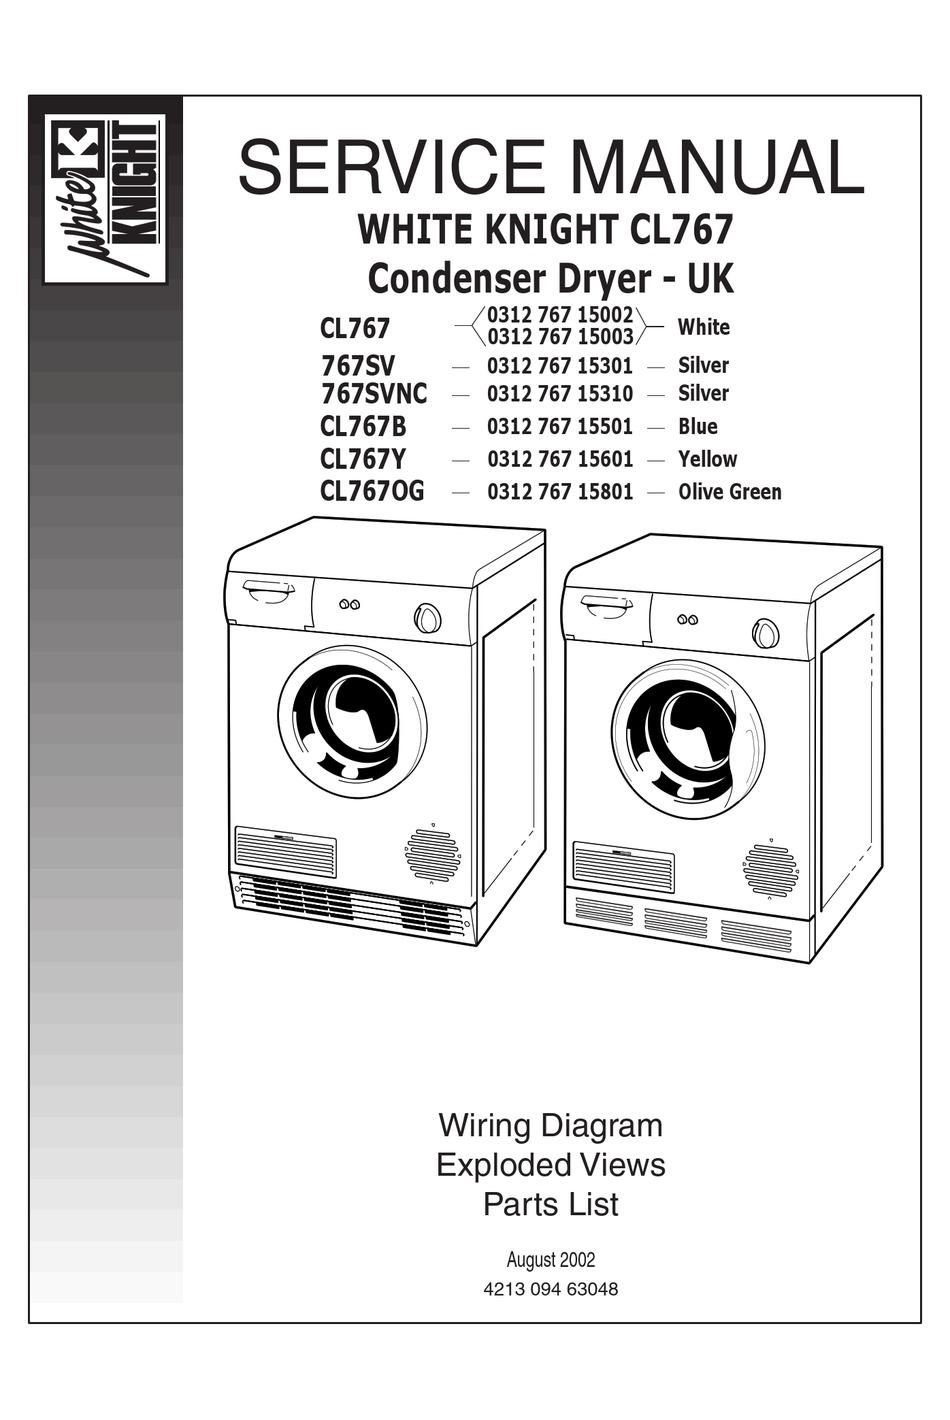 WHITE KNIGHT CL767 SERVICE MANUAL Pdf Download | ManualsLib | White Knight Tumble Dryer Wiring Diagram |  | ManualsLib